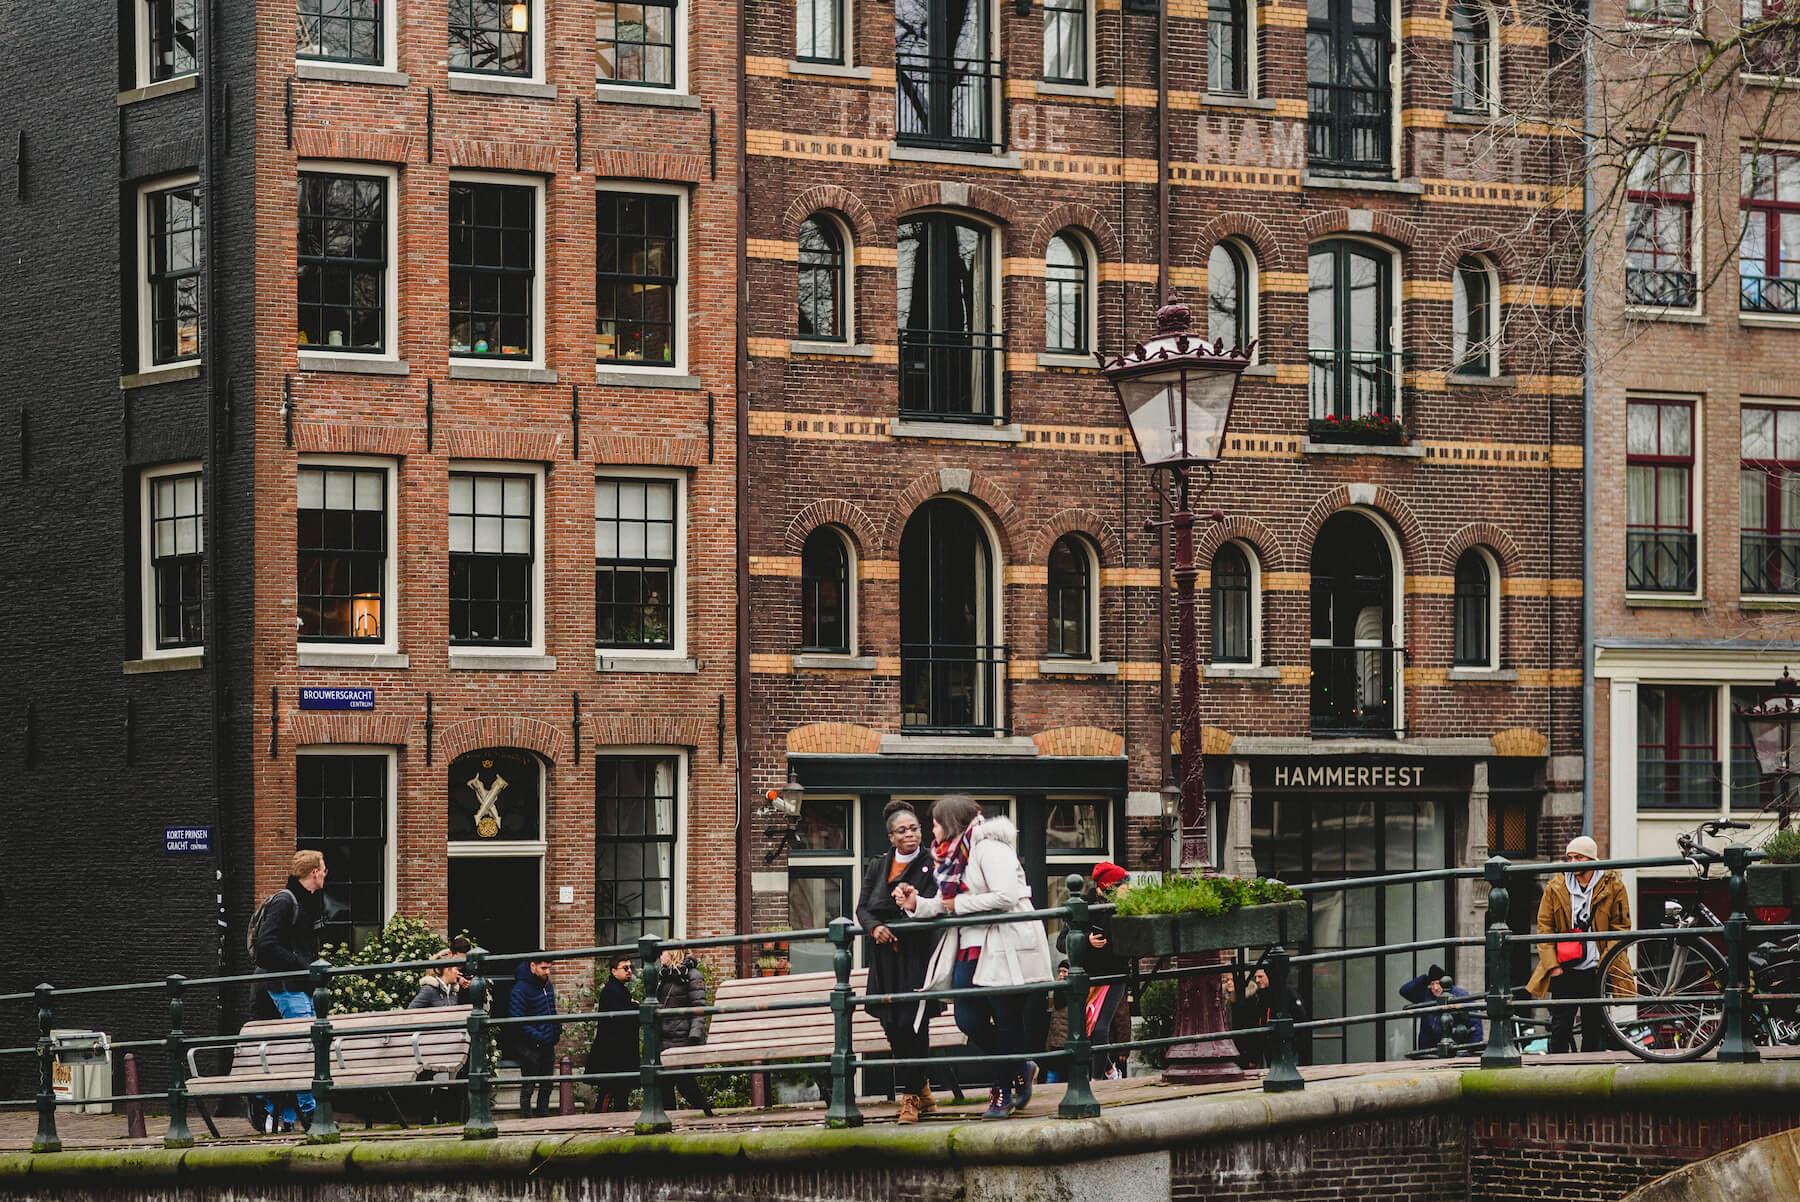 amsterdam-12-26-2019-couples-trip-6_original